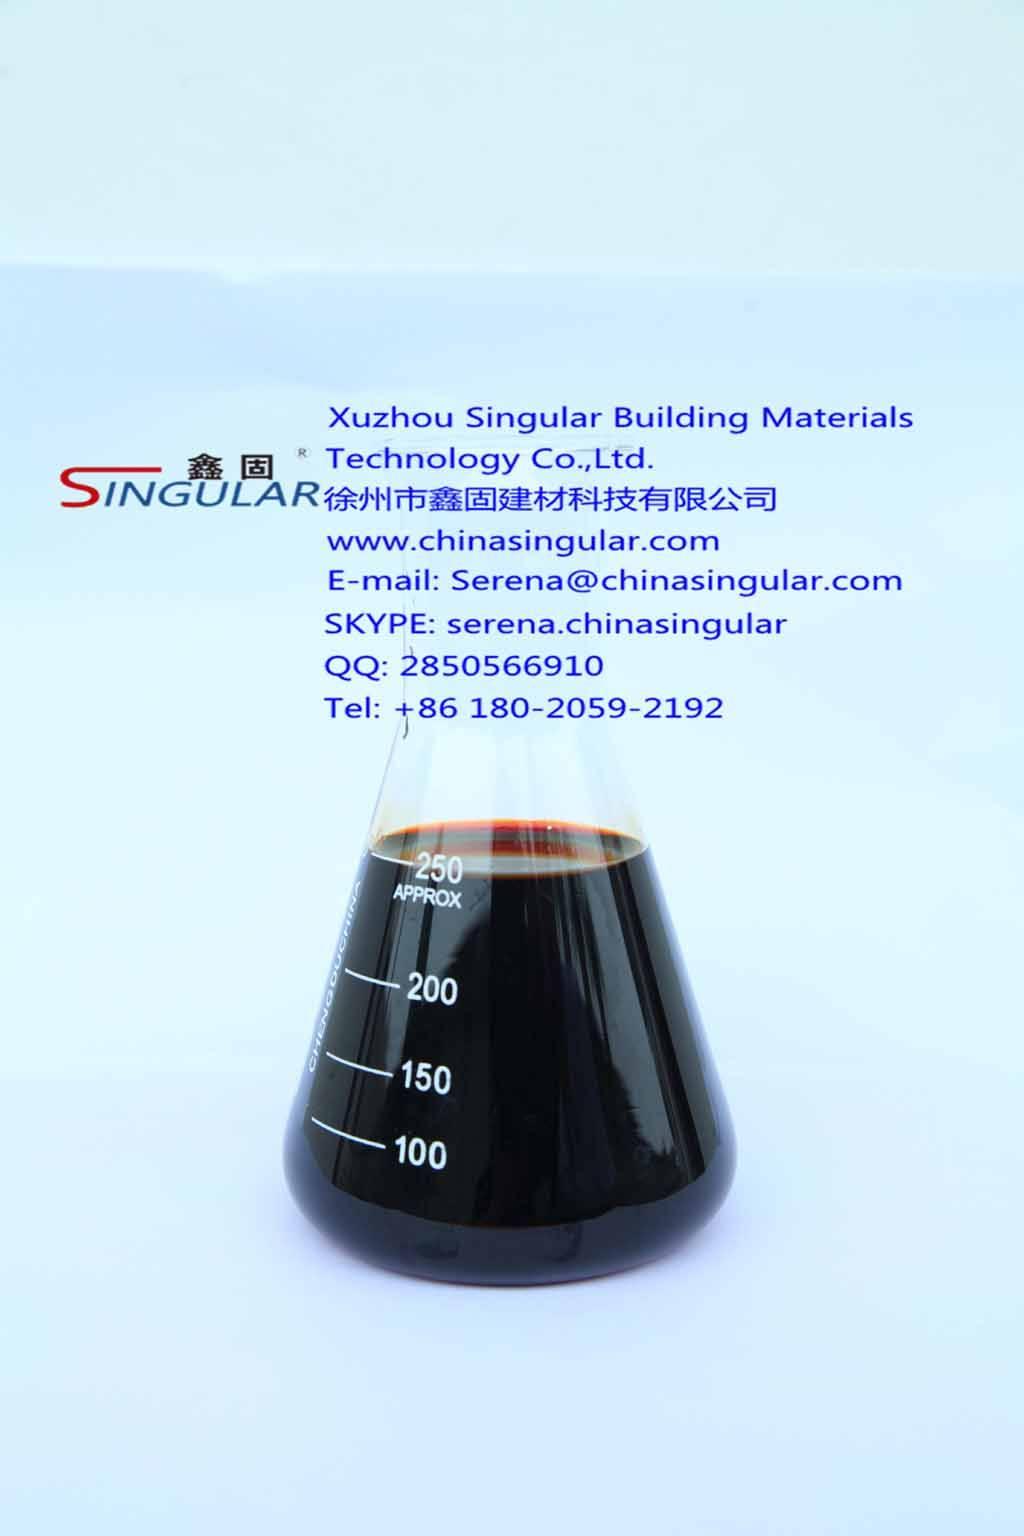 ZM-5B Concrete Hardening acceleratar/cement admixture- Singular manufacture